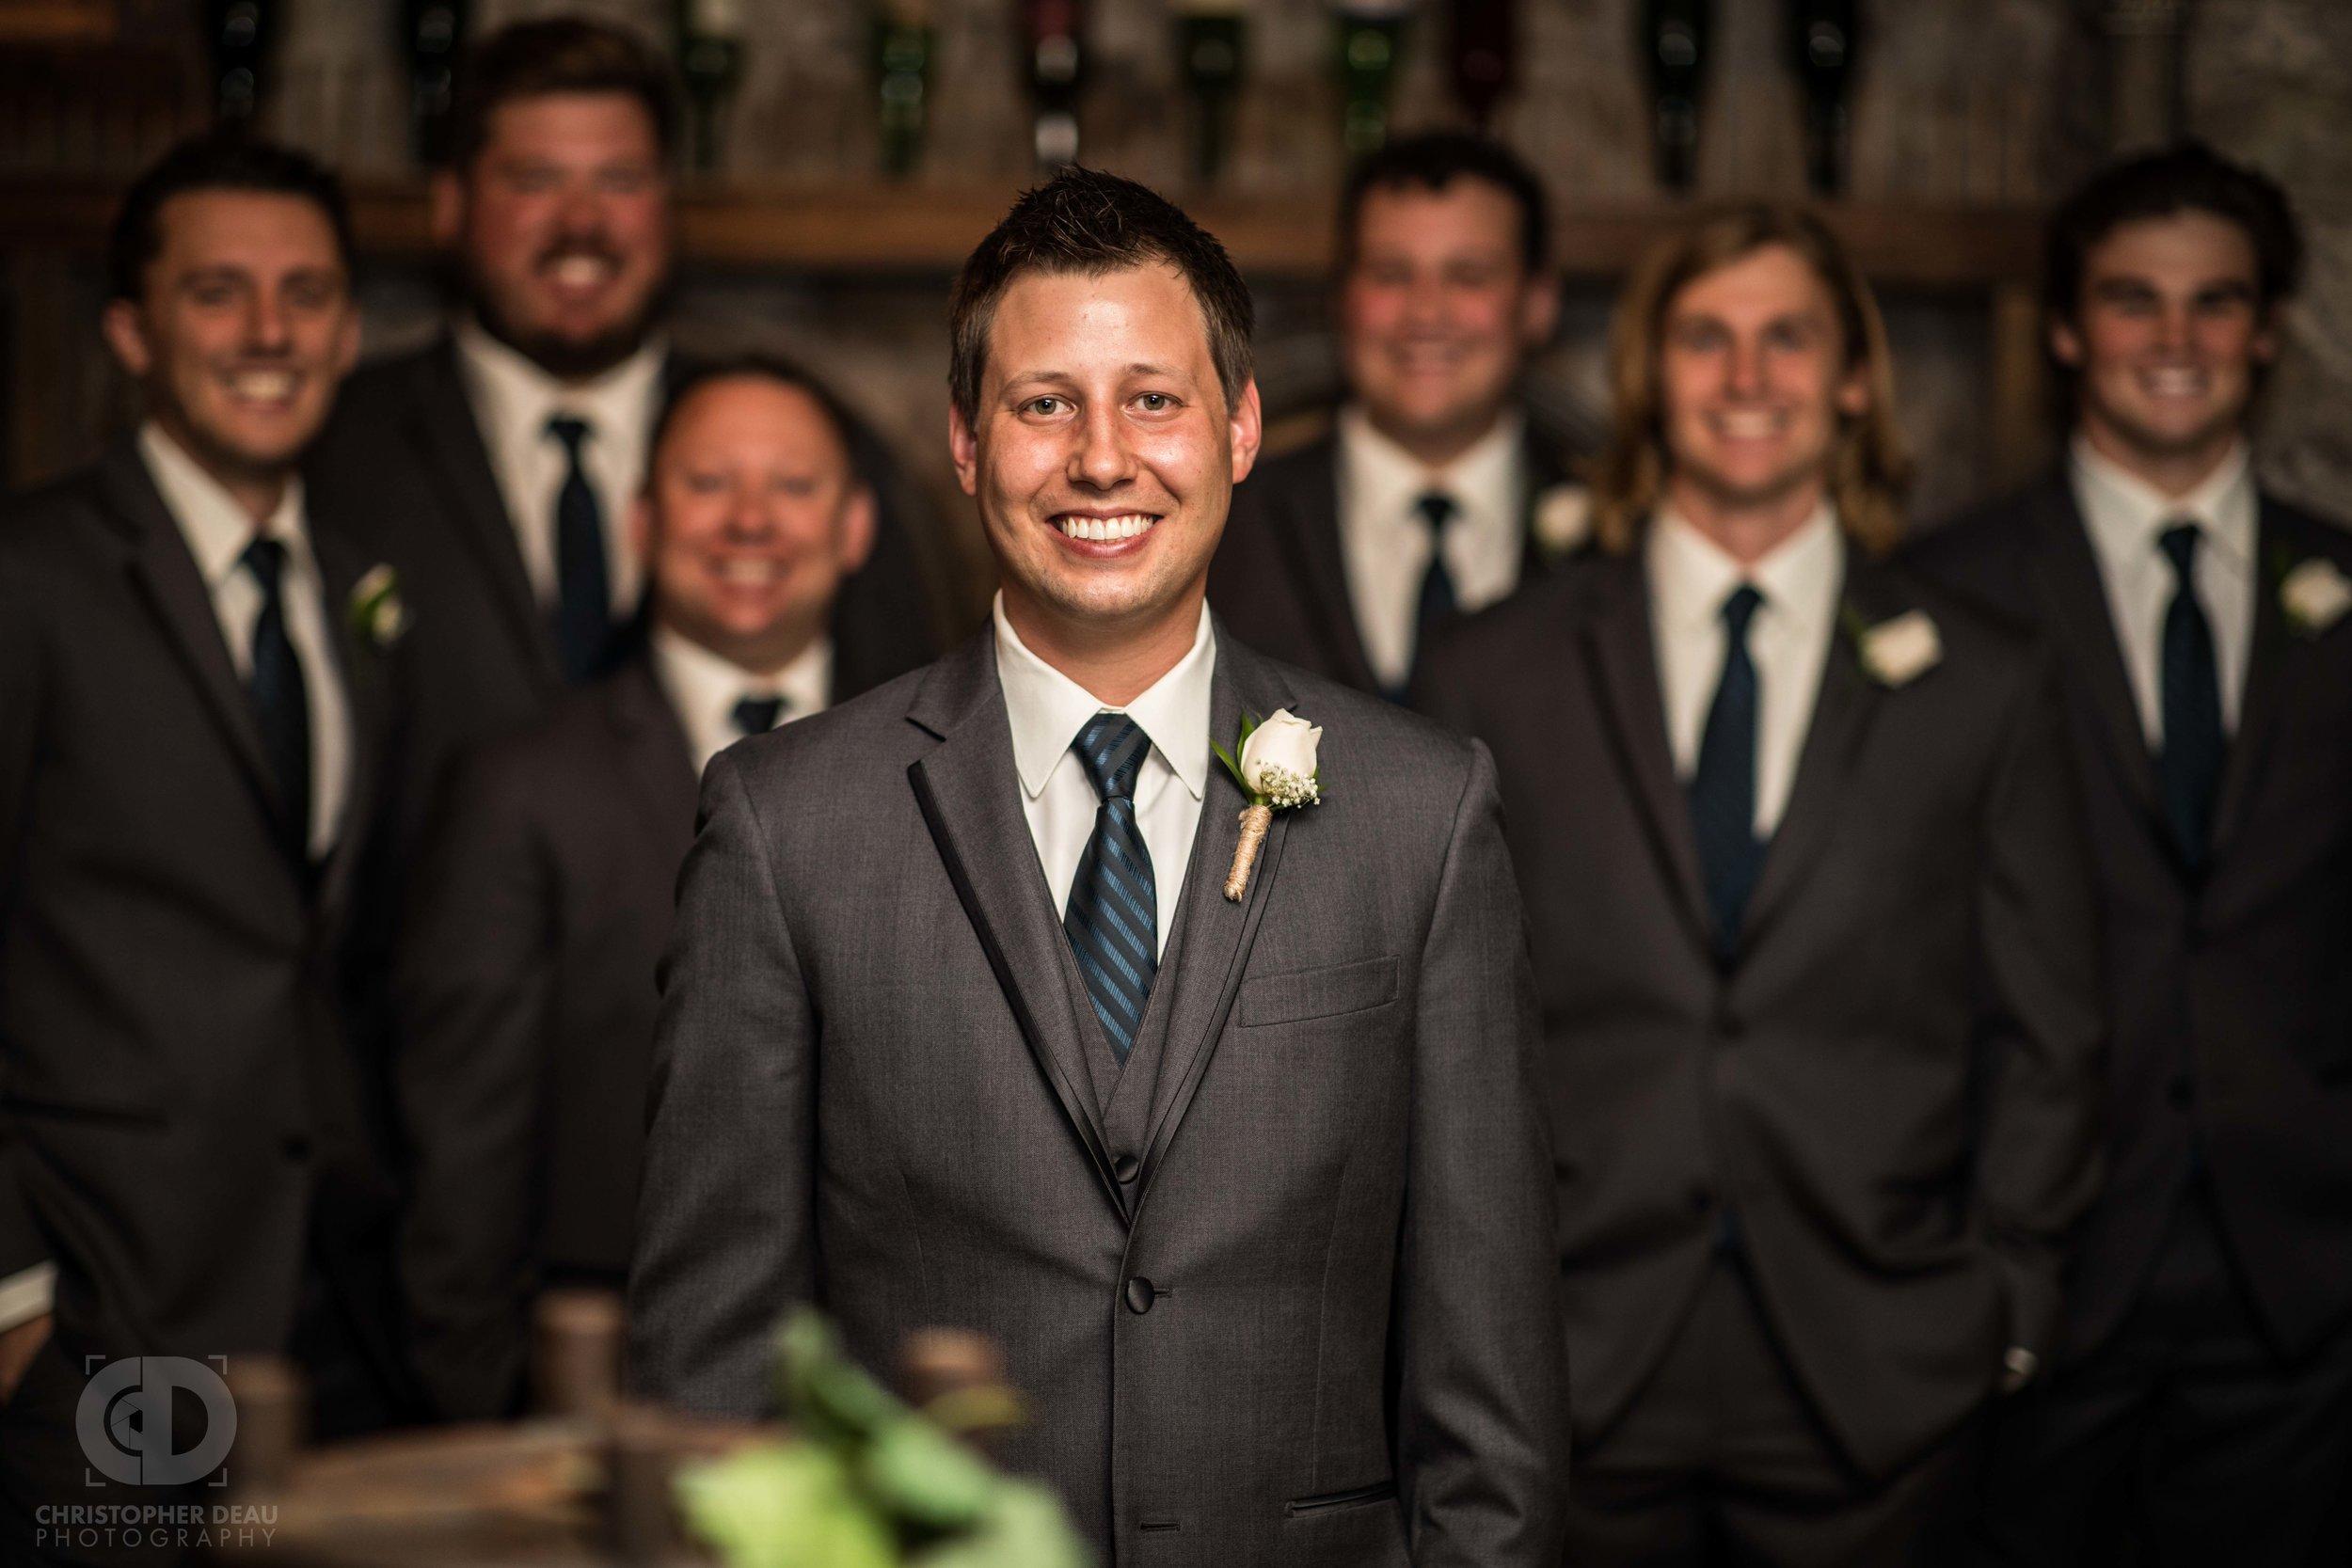 groom and groomsmen portraits in a wine cellar